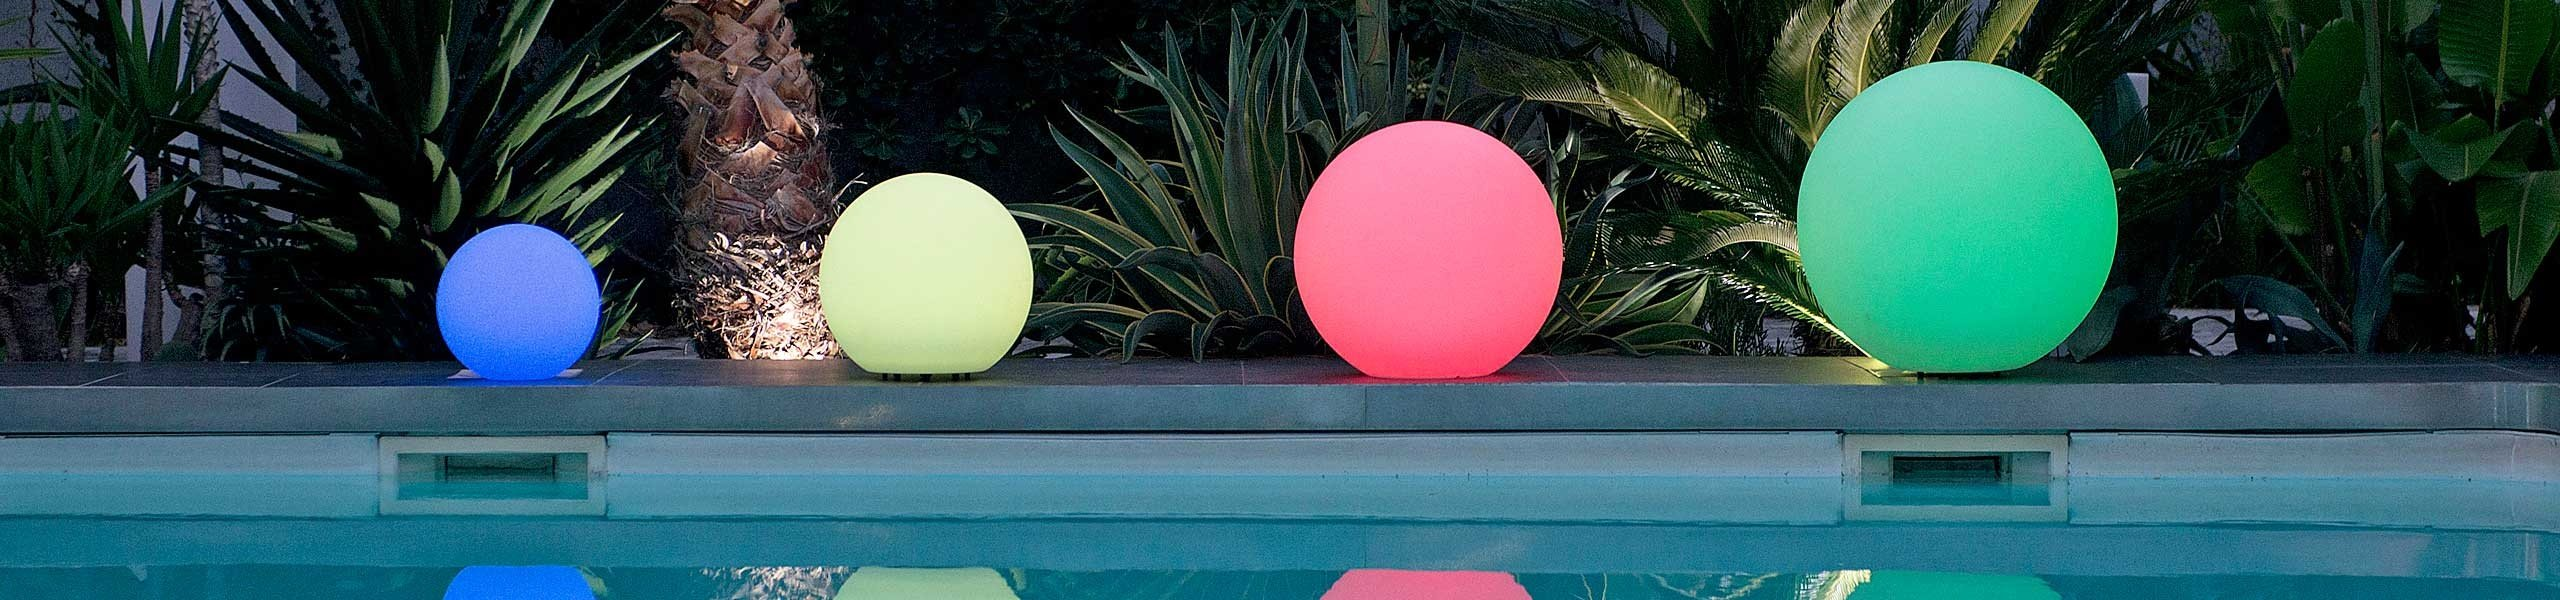 Boules lumineuses piscine